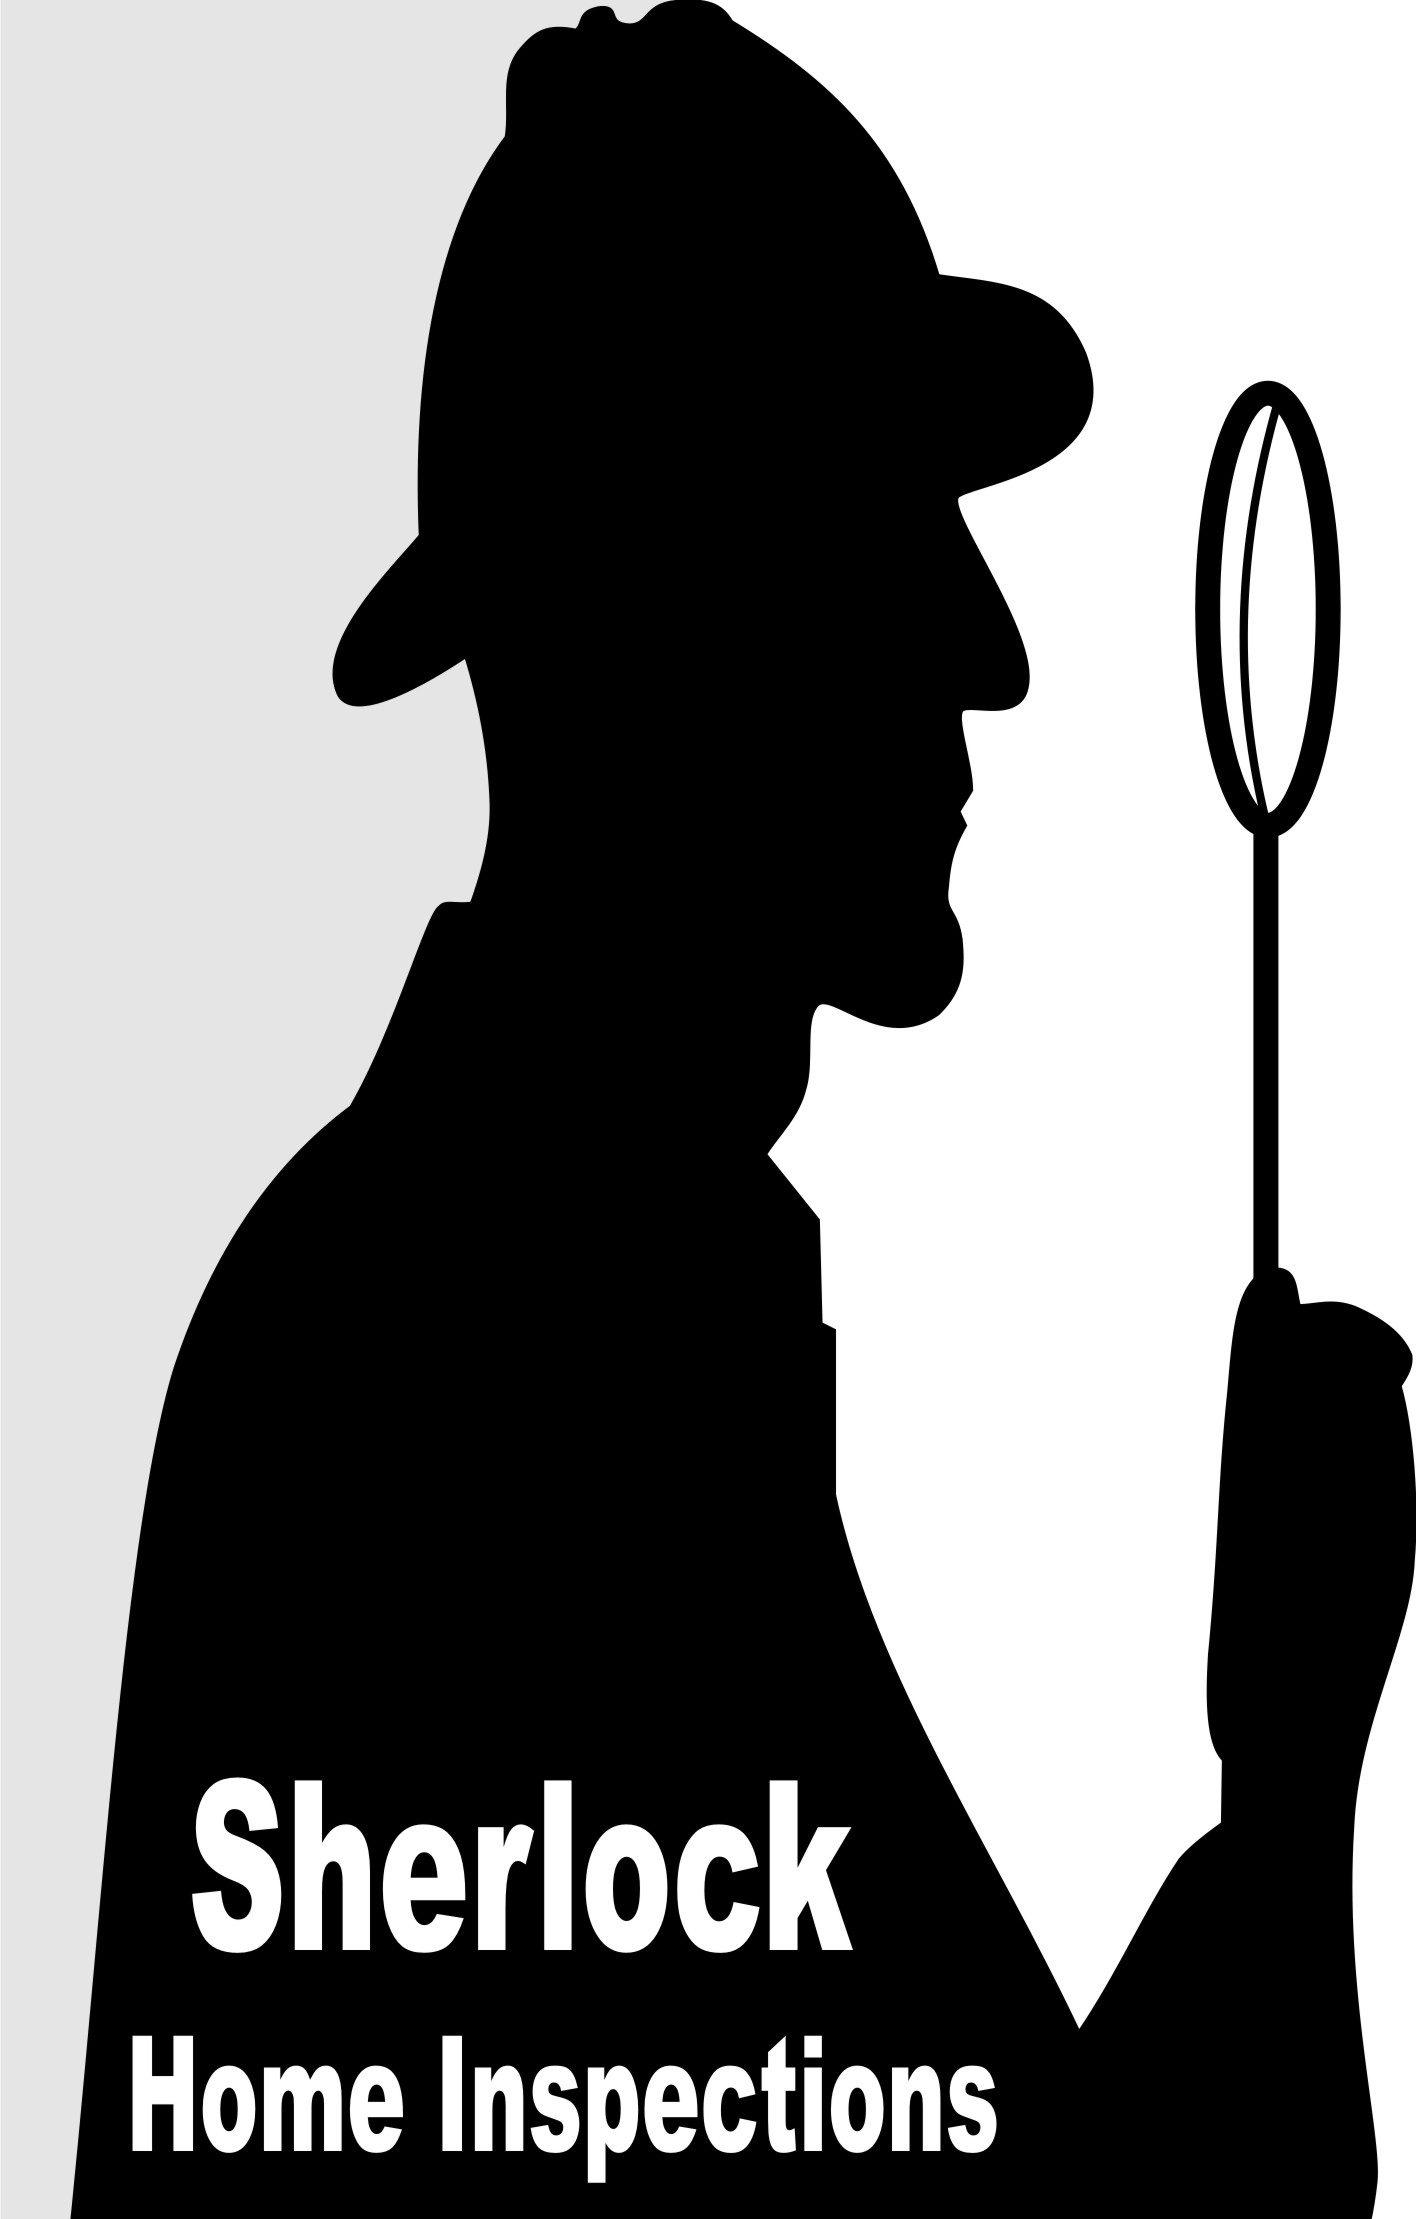 Sherlock Home Inspections